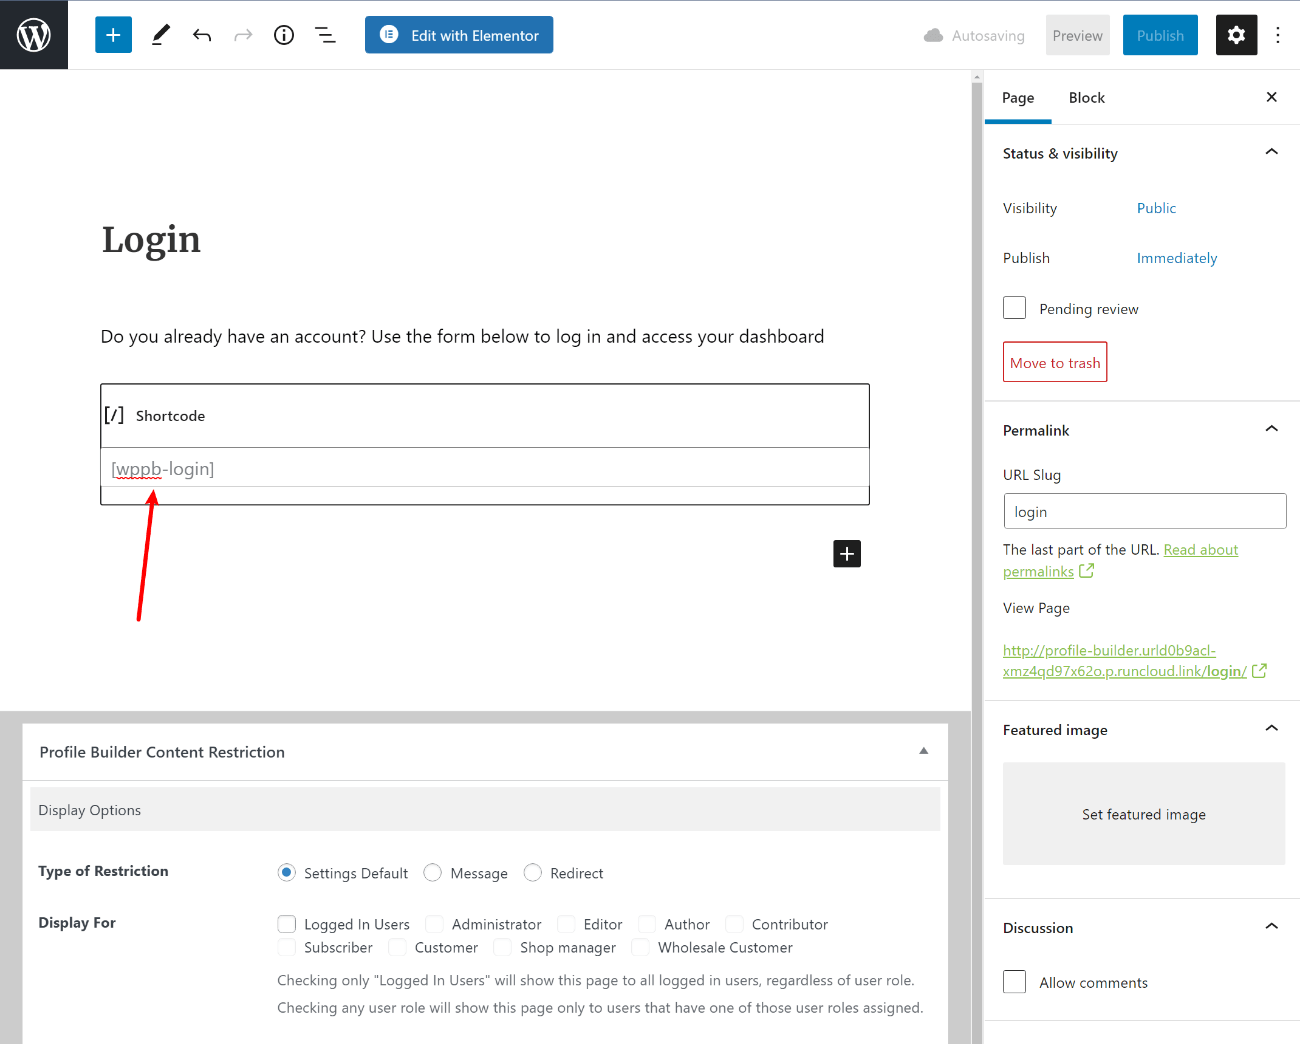 Adding login shortcode